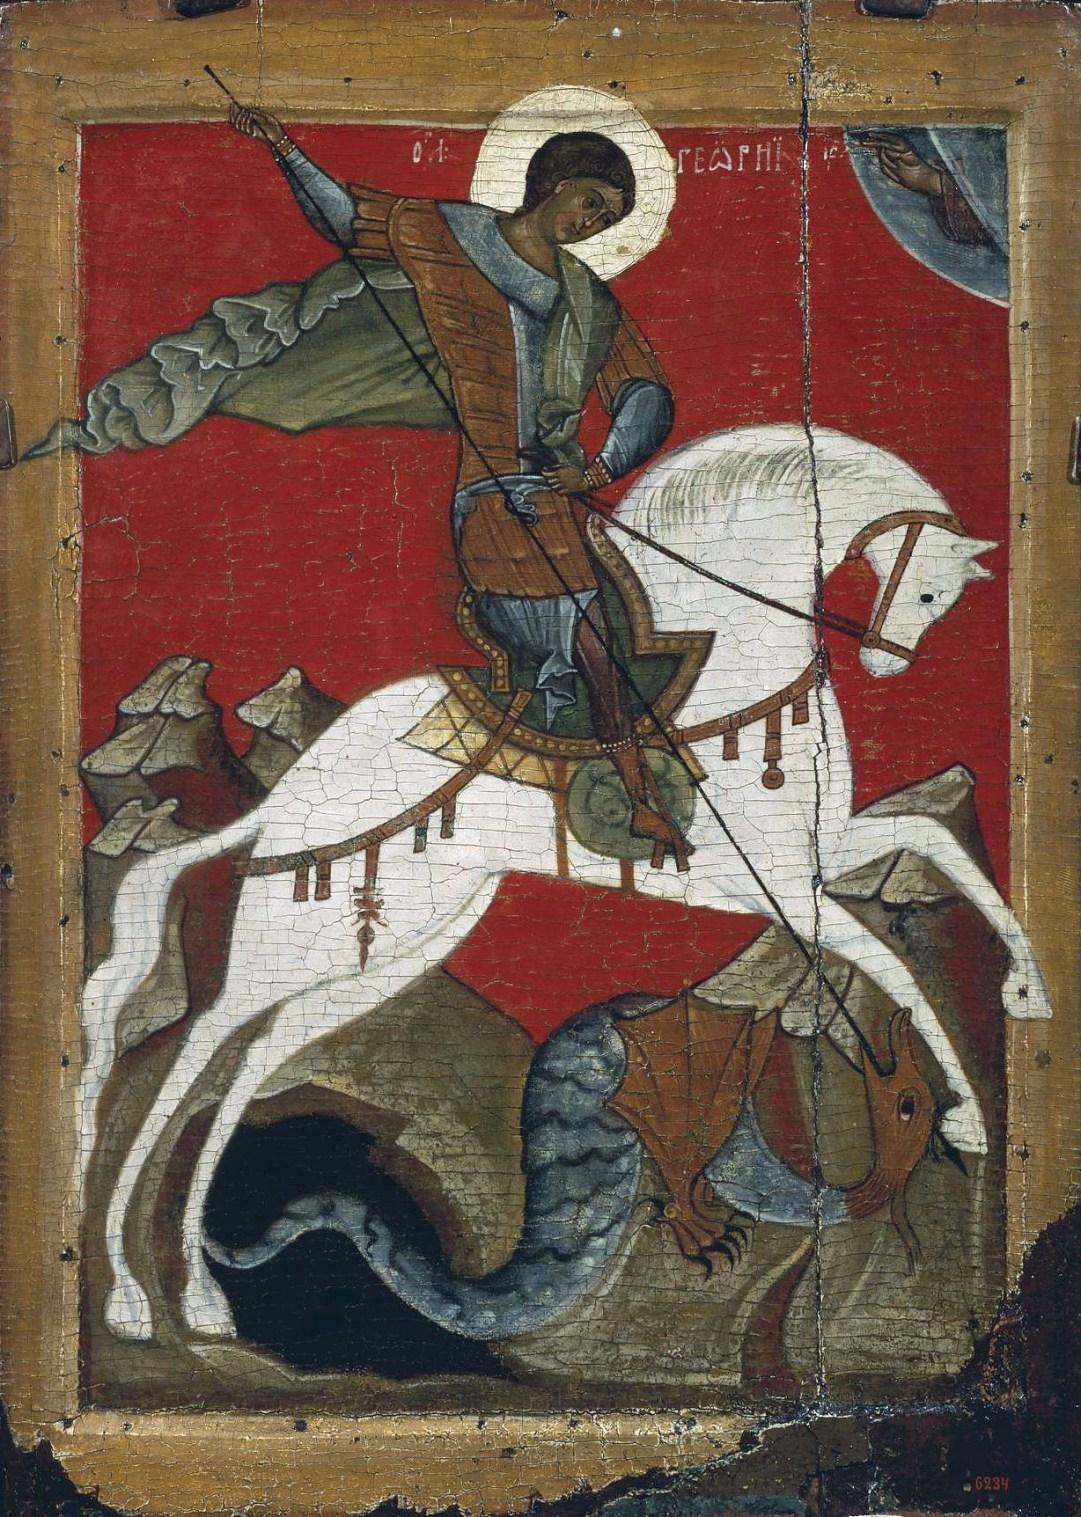 Великомученик Георгий Победоносец. Икона, конец XIV - начало XV века. Новгород